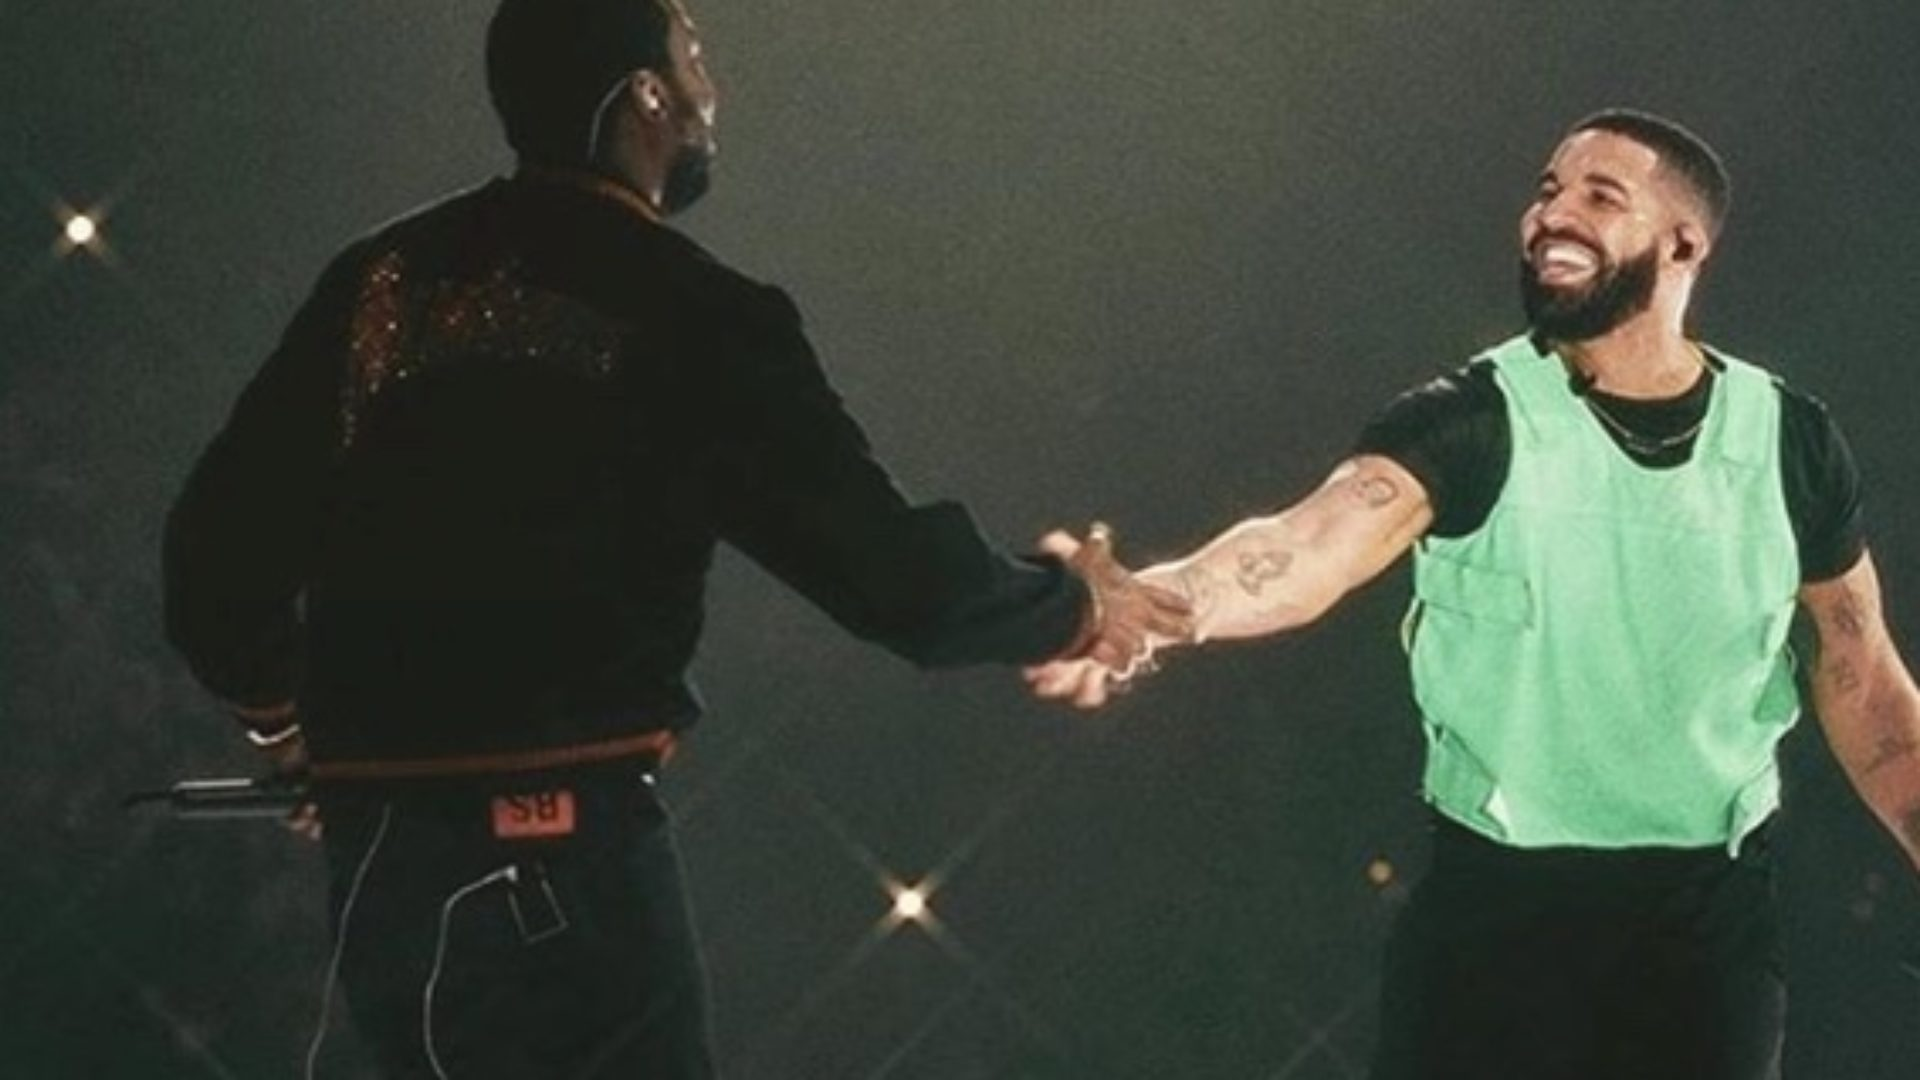 Drake Ends Feud With Meek Mill By Bringing Him Onstage